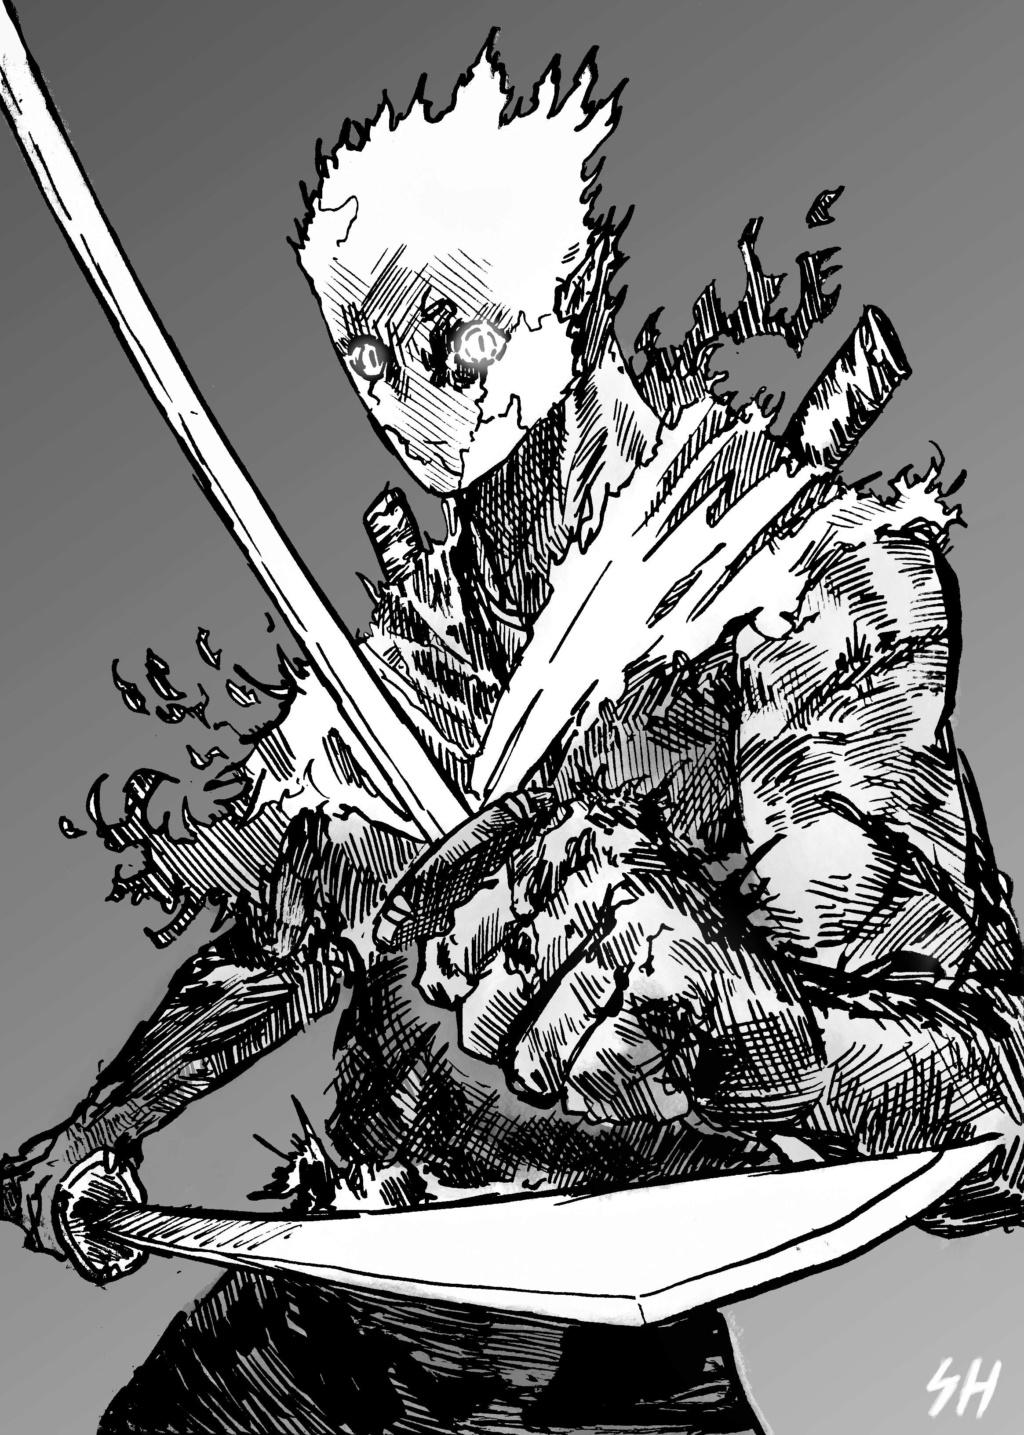 Lider Ninja - One Punch Man 26410